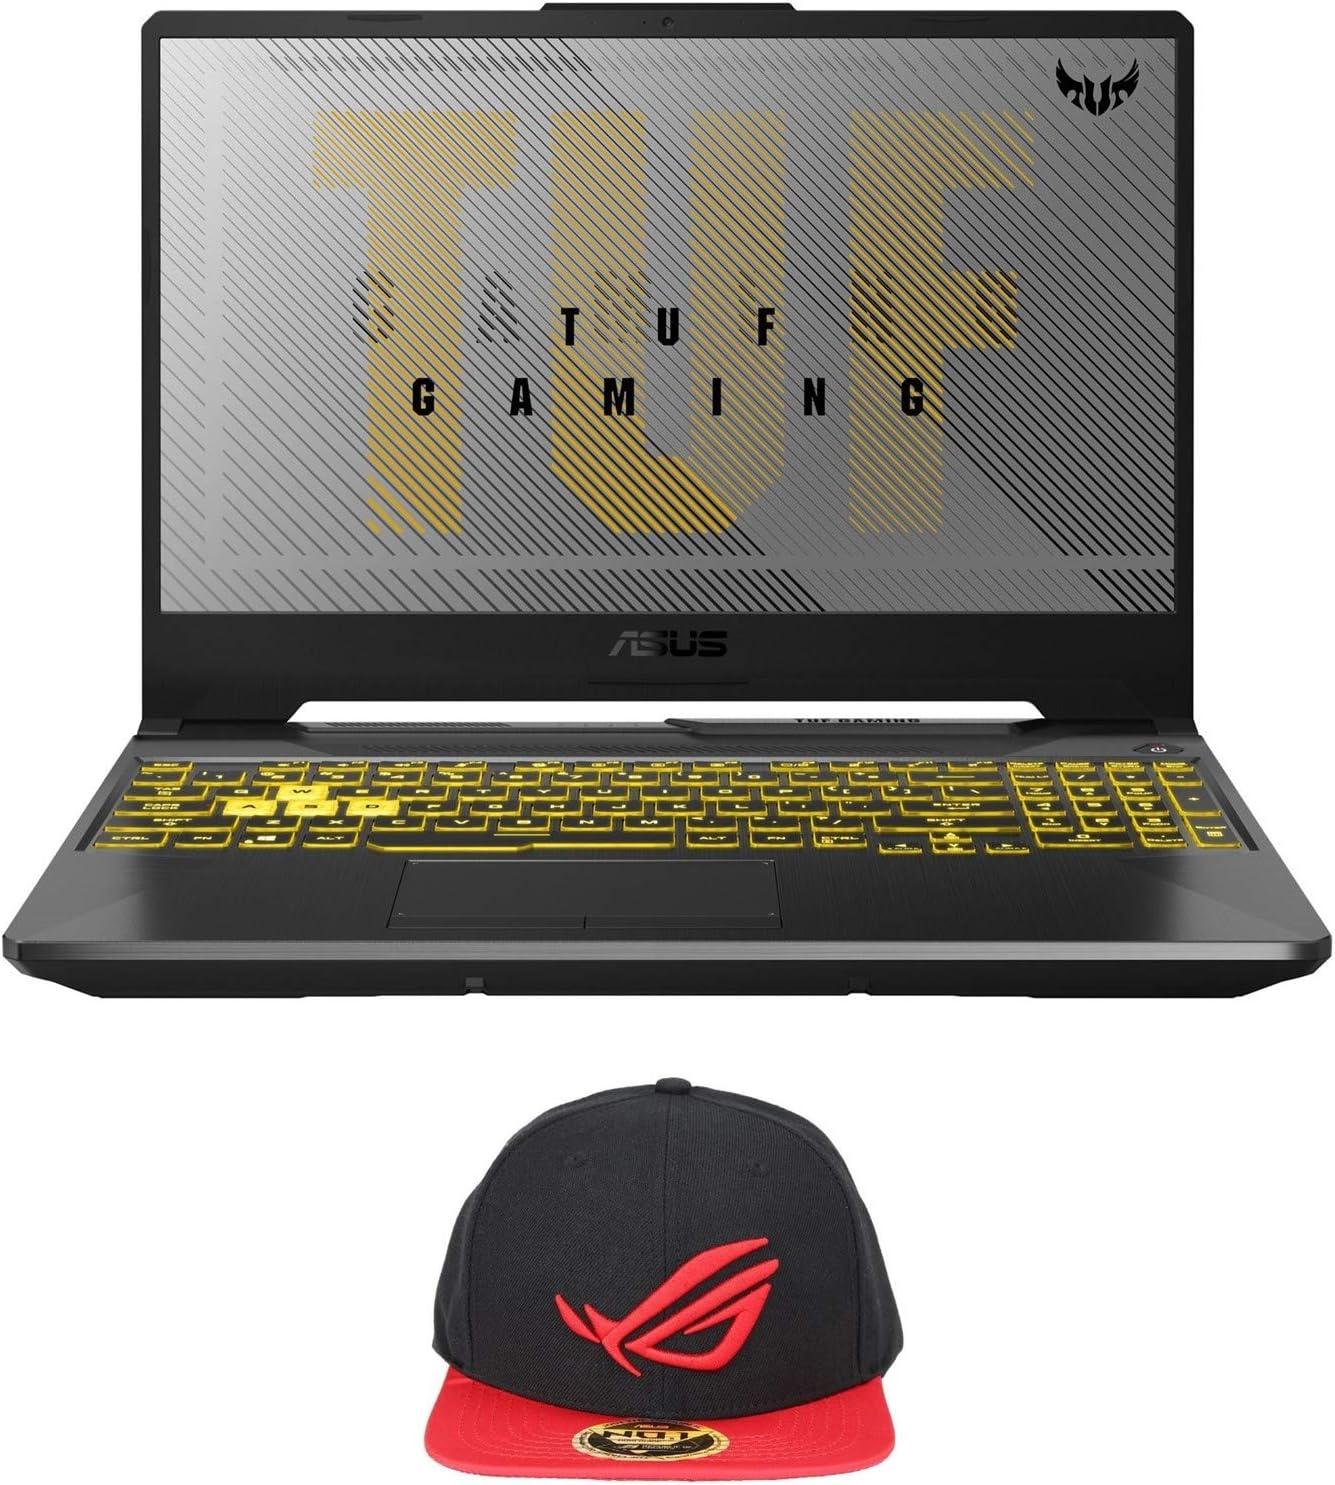 "ASUS TUF Gaming A15 TUF506IH (AMD Ryzen 5 4600H, 8GB RAM, 512GB NVMe SSD, GTX 1650 4GB, 15.6"" Full HD, Windows 10) Gaming Notebook"